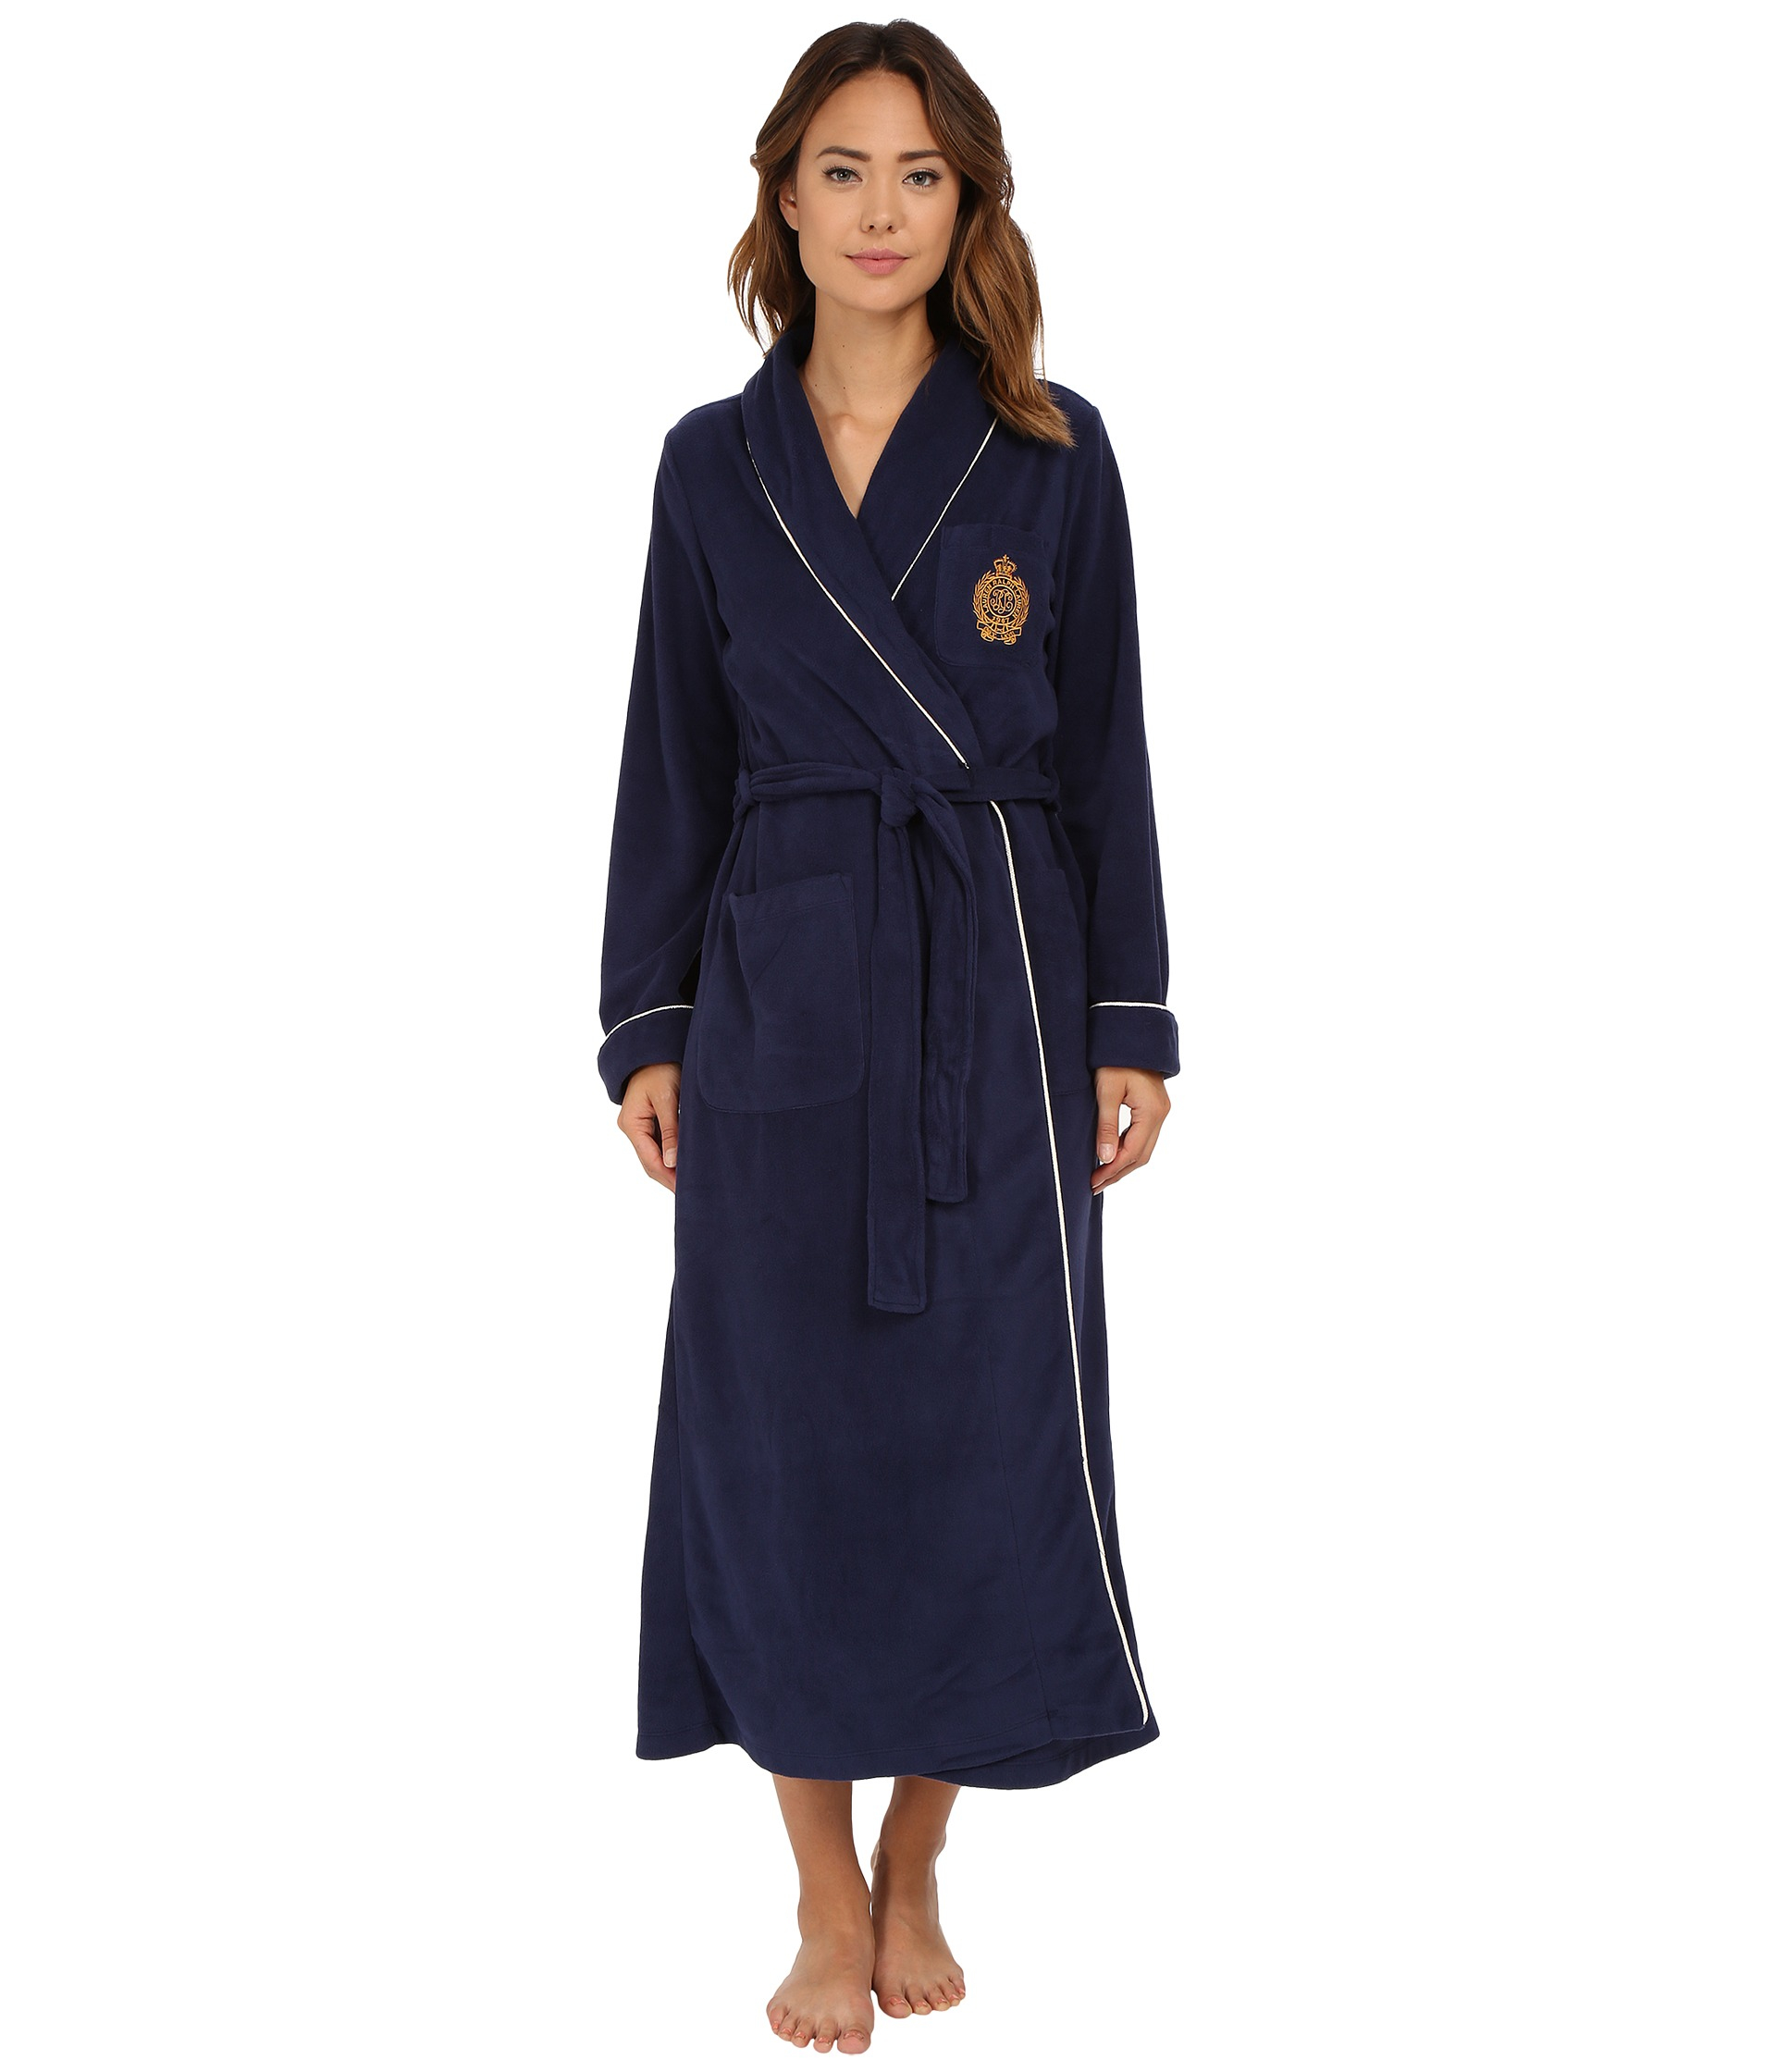 lauren by ralph lauren folded dalton fleece long robe in blue lyst. Black Bedroom Furniture Sets. Home Design Ideas